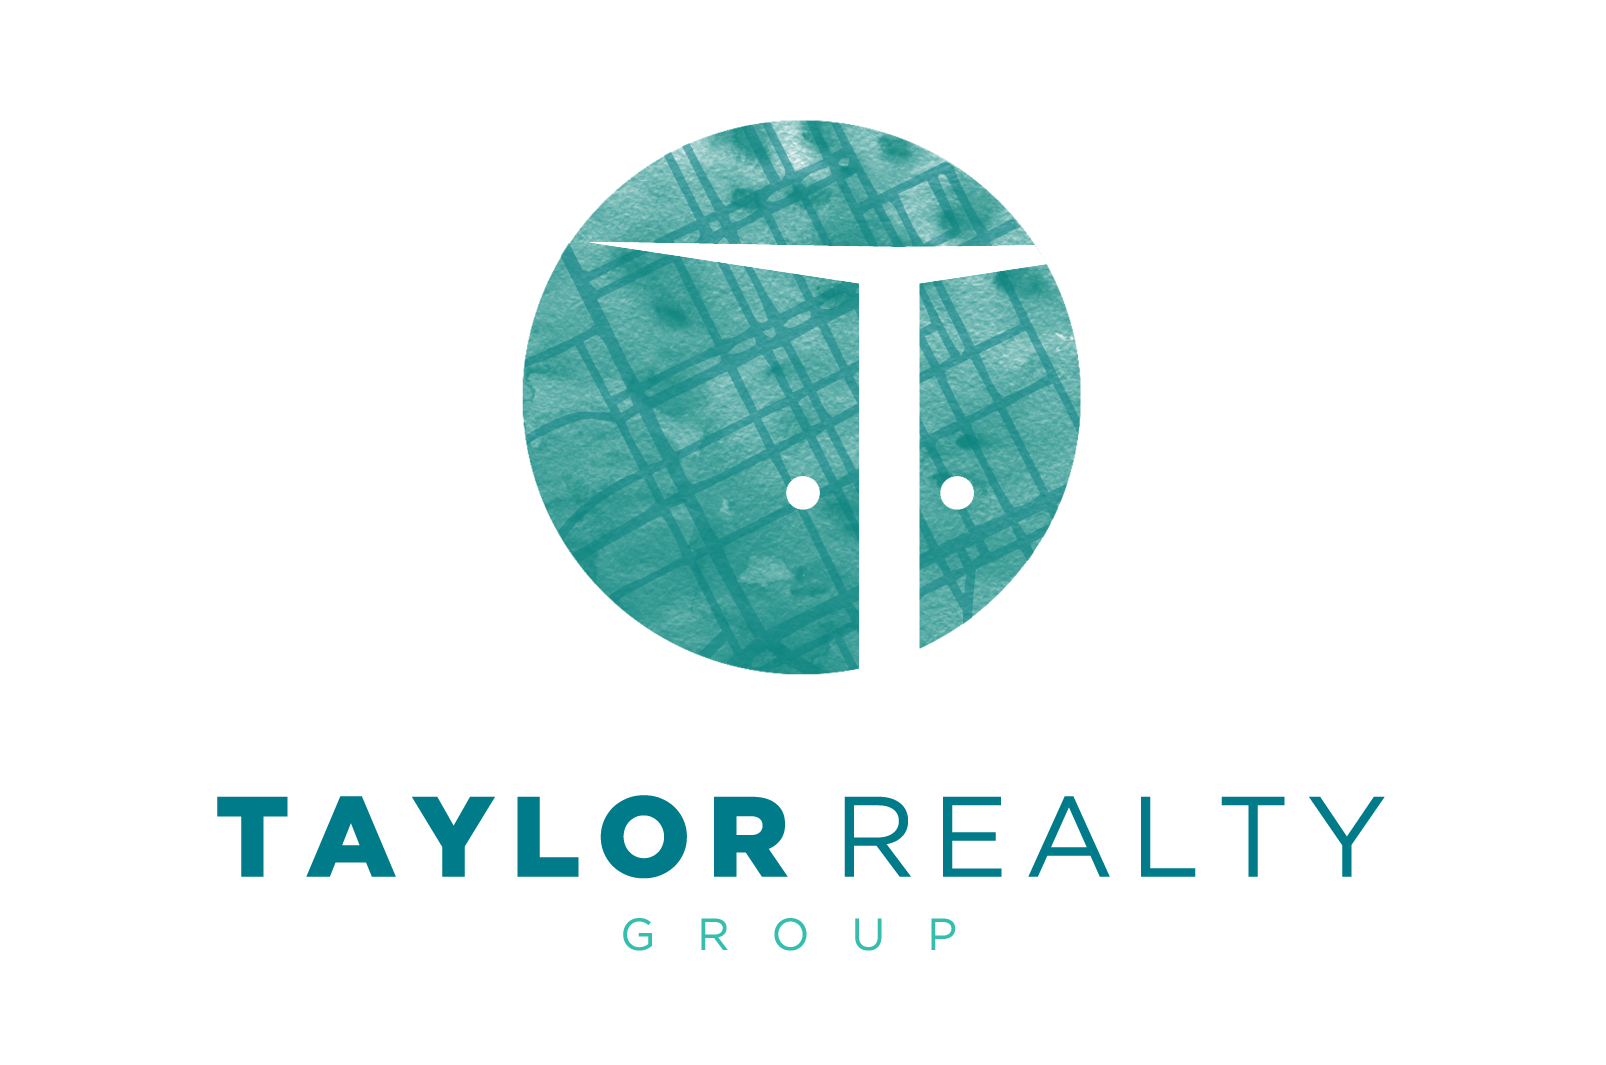 TaylorRealty_Vertical Logo_PantoneMS_081018.png